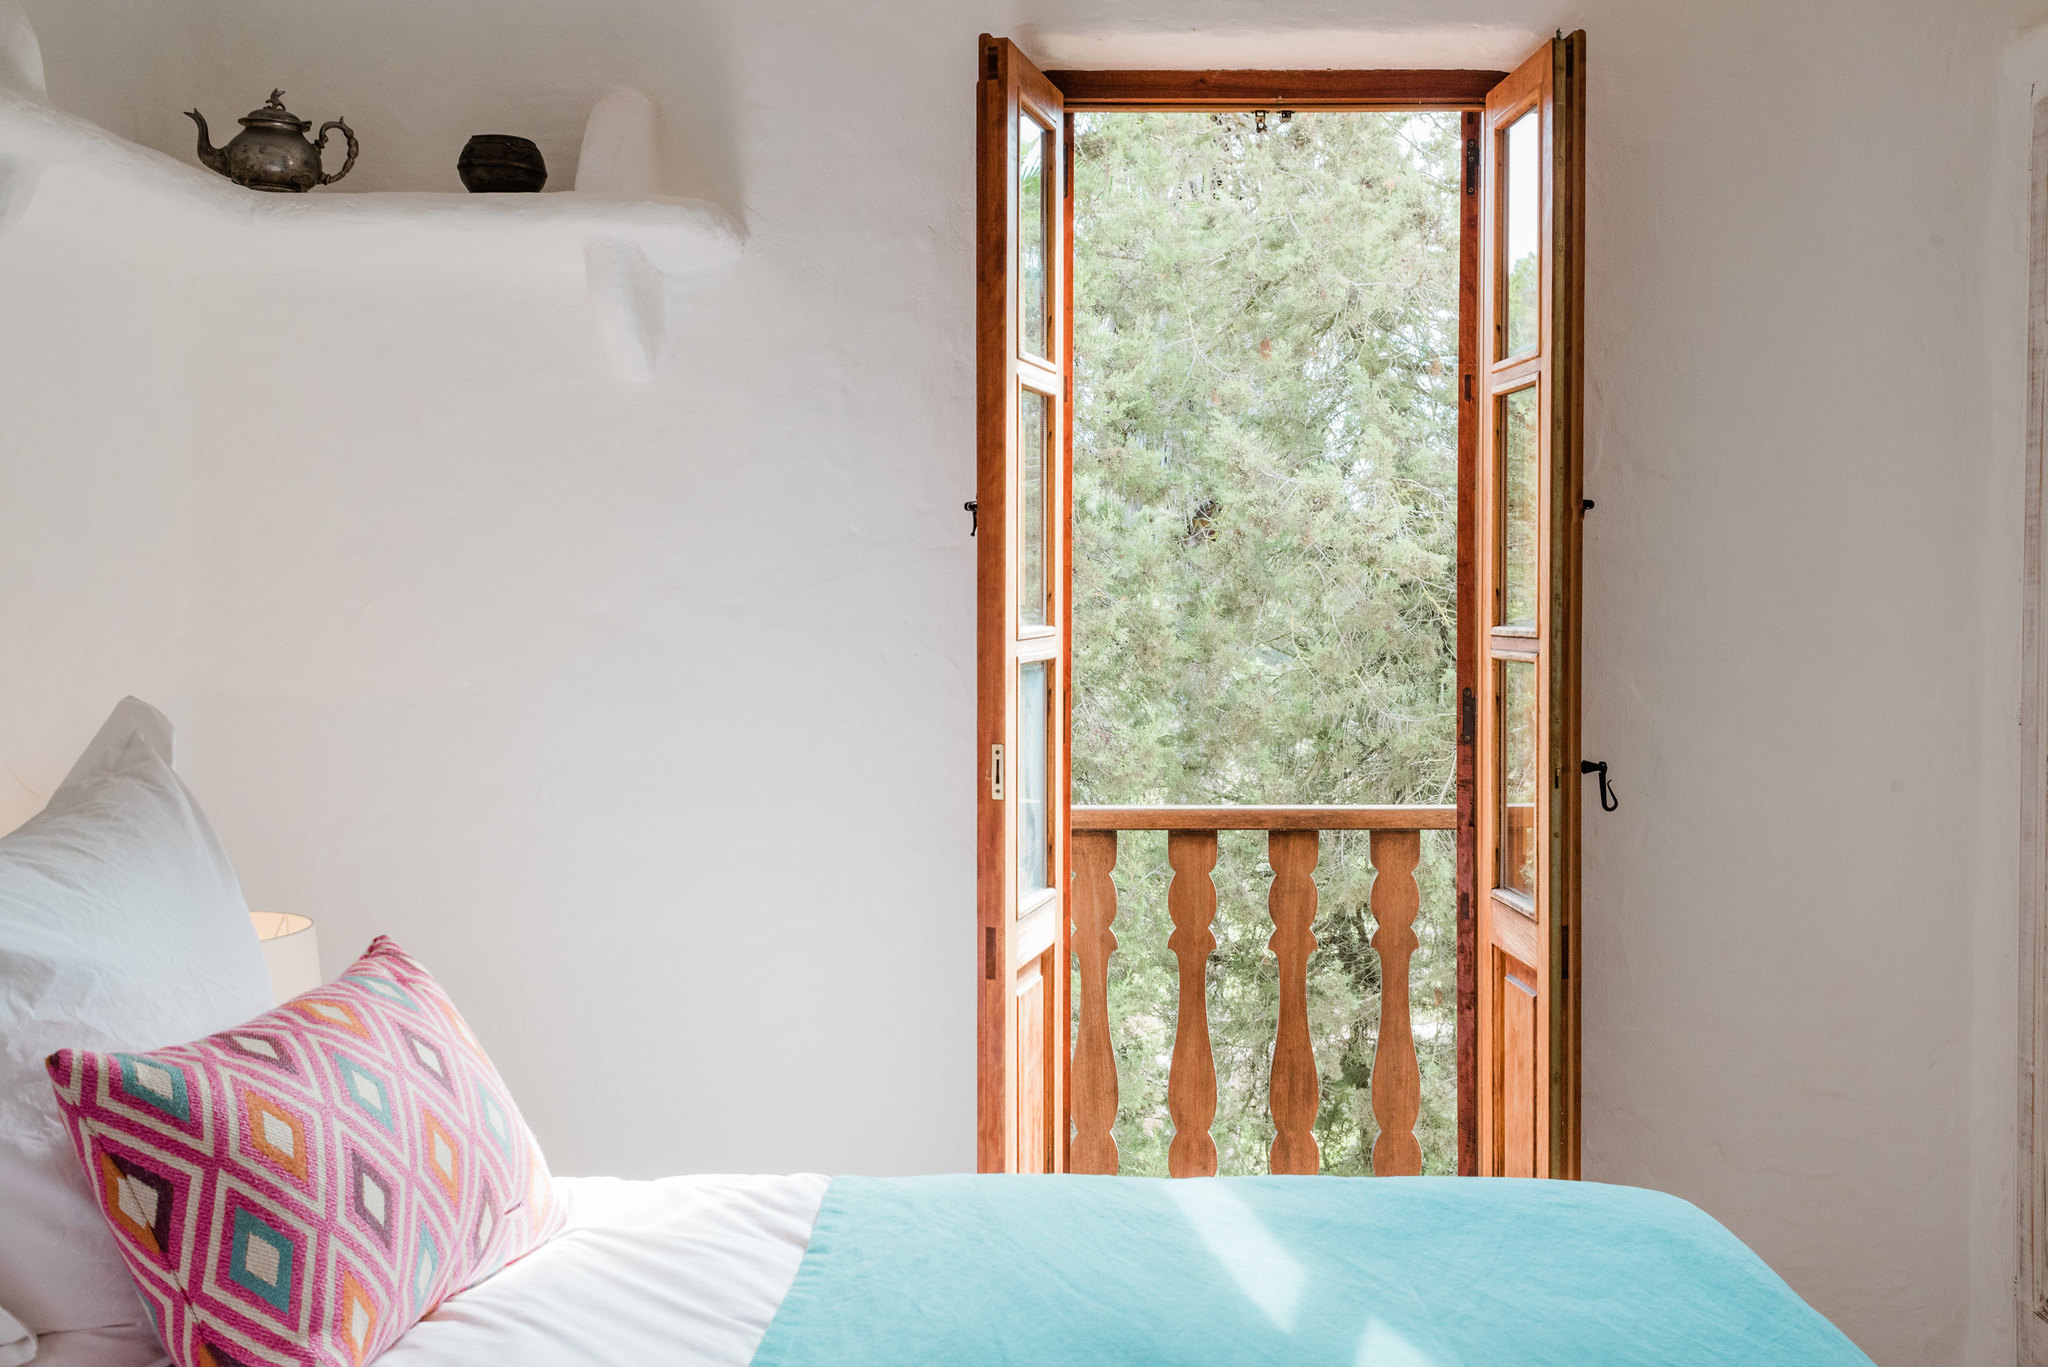 https://www.white-ibiza.com/wp-content/uploads/2020/05/white-ibiza-villas-can-sabina-interior-bedroom3.jpg